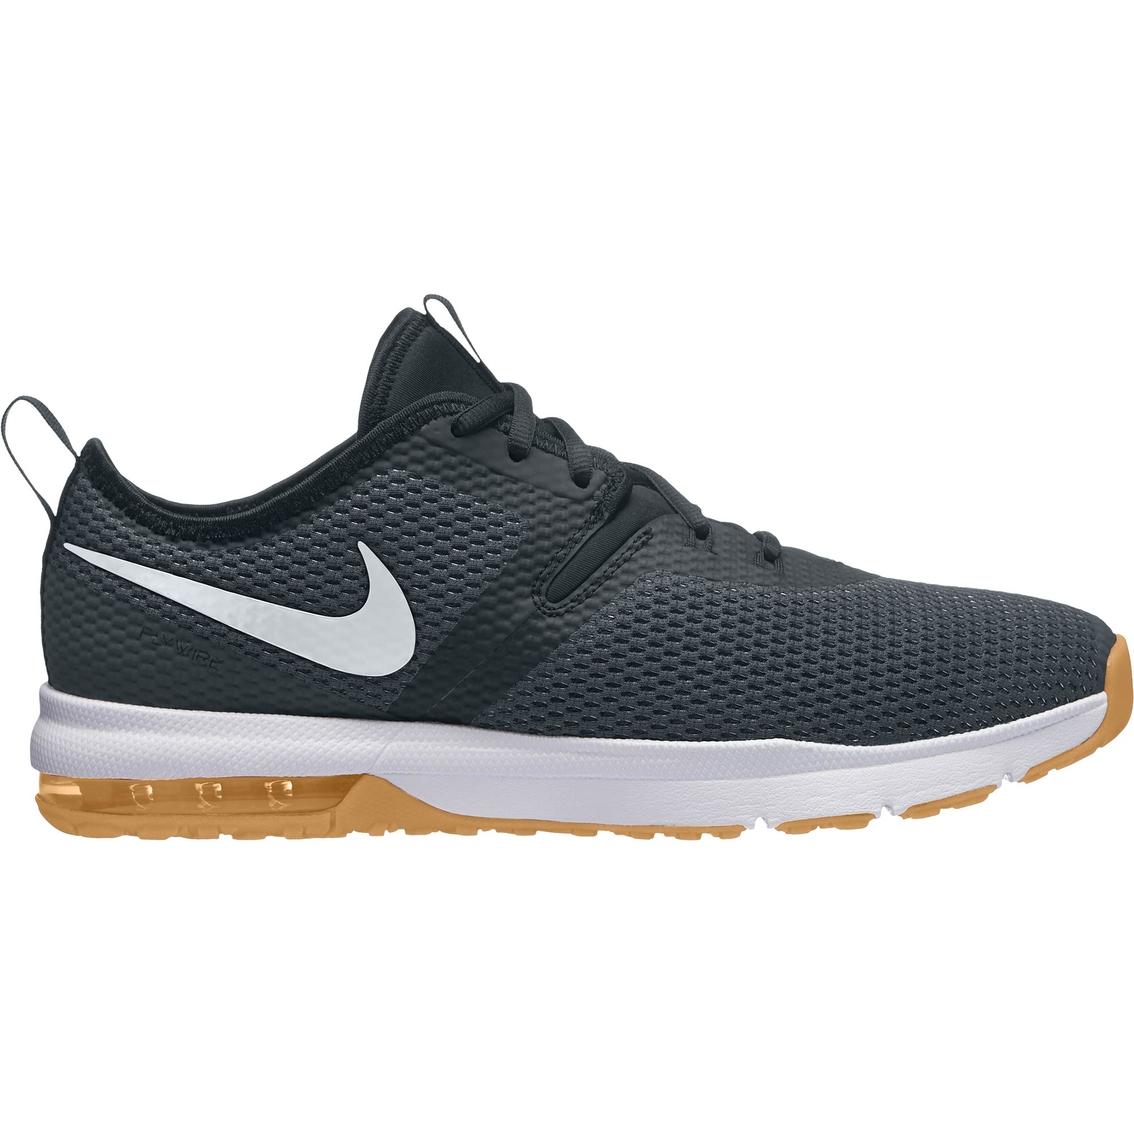 Nike Men s Air Max Typha 2 Training Shoes  a05da91e9